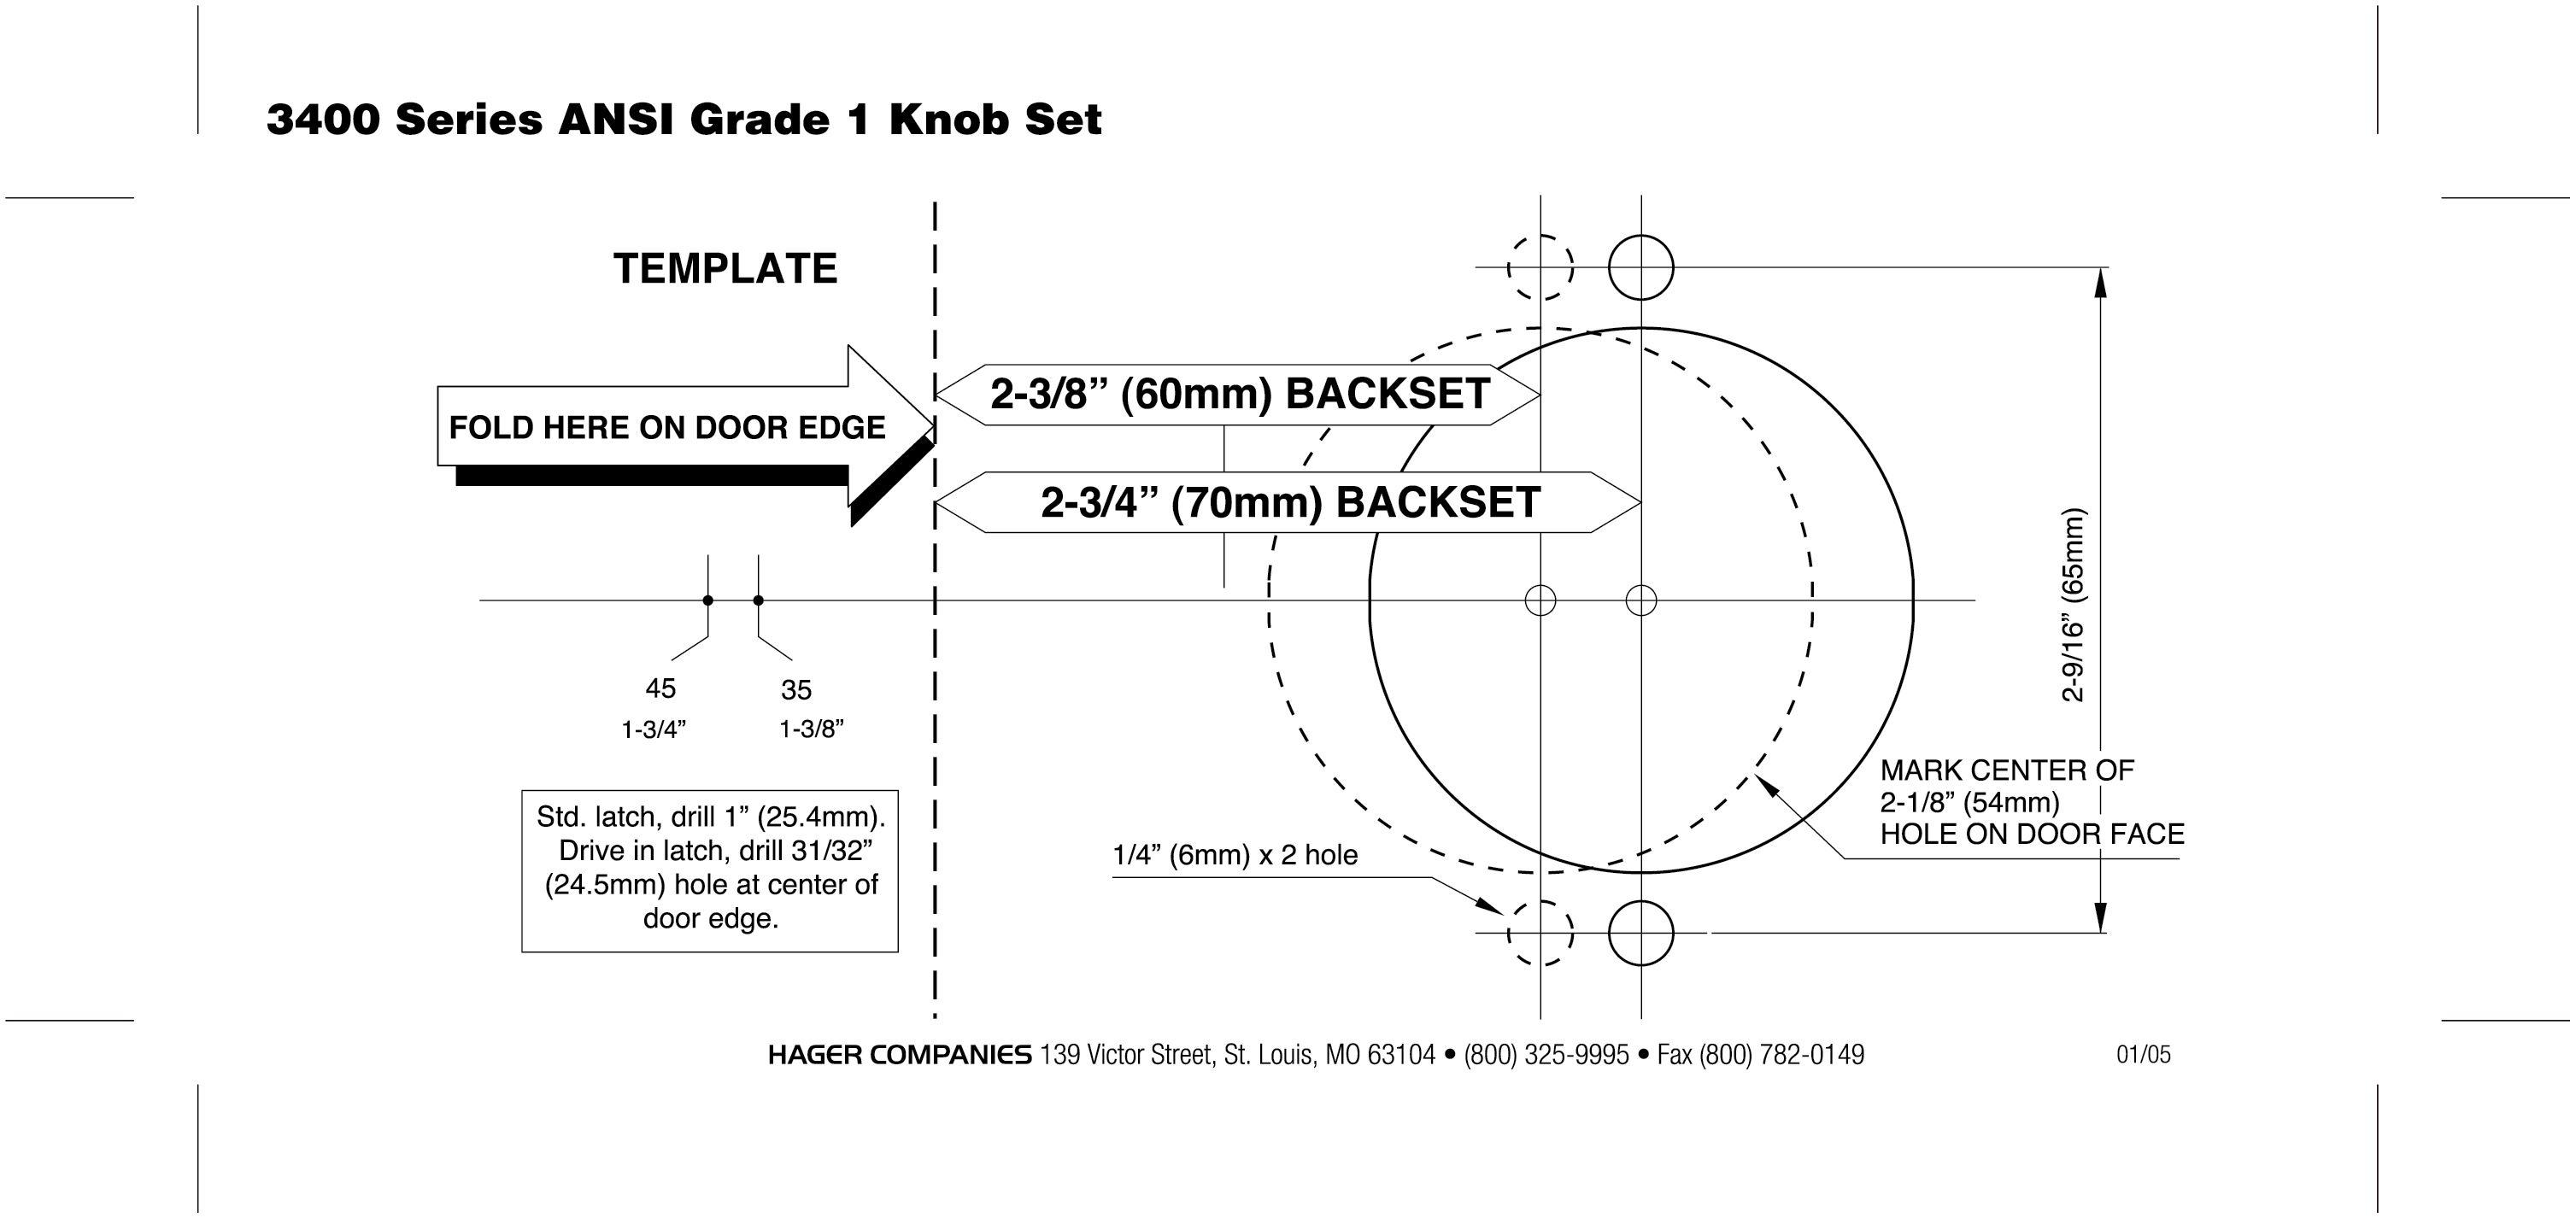 hager 3400 series knob lock template